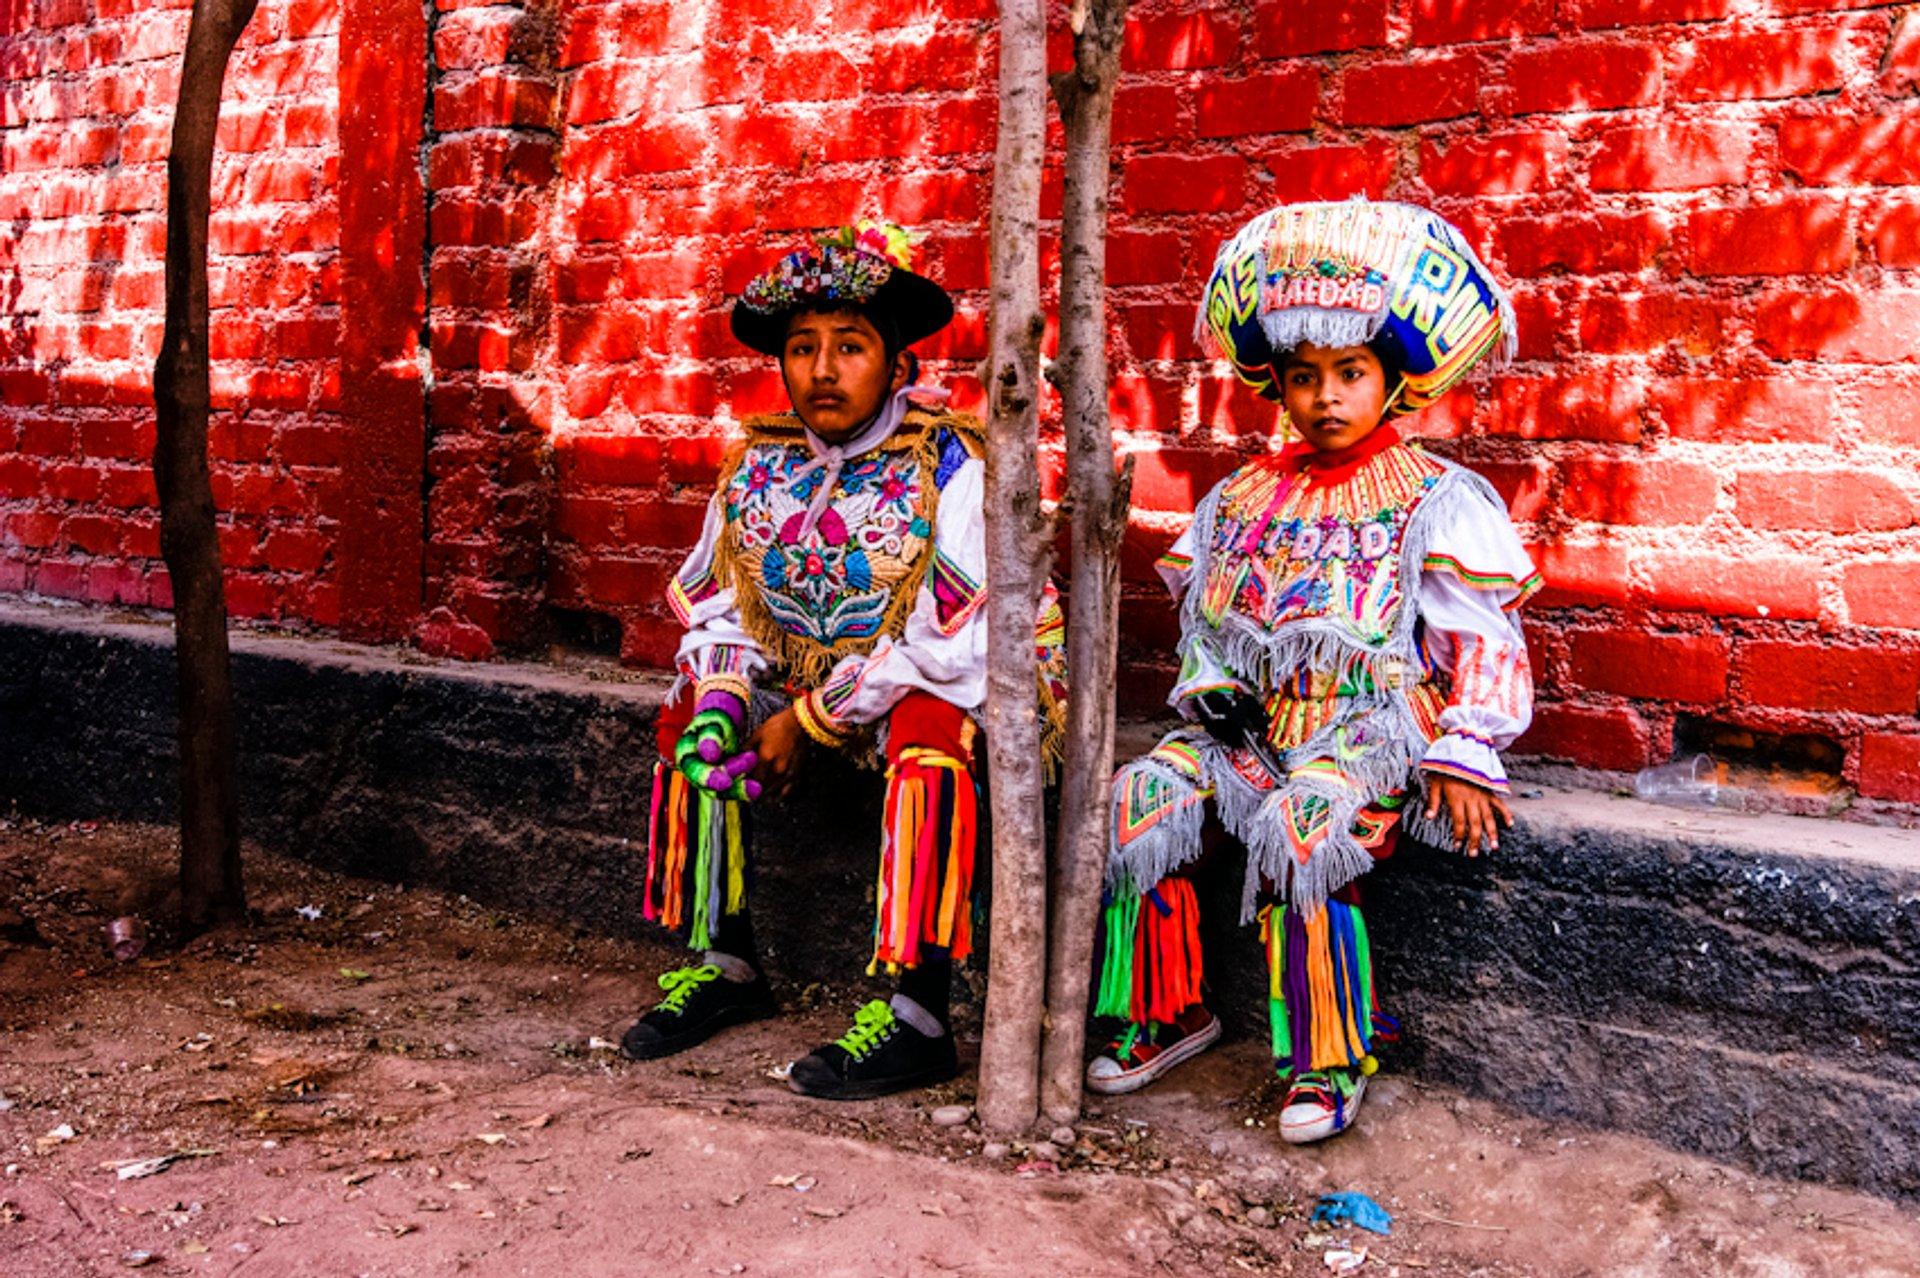 Best time to see Scissors Dance or La Danza de las Tijeras in Peru 2019